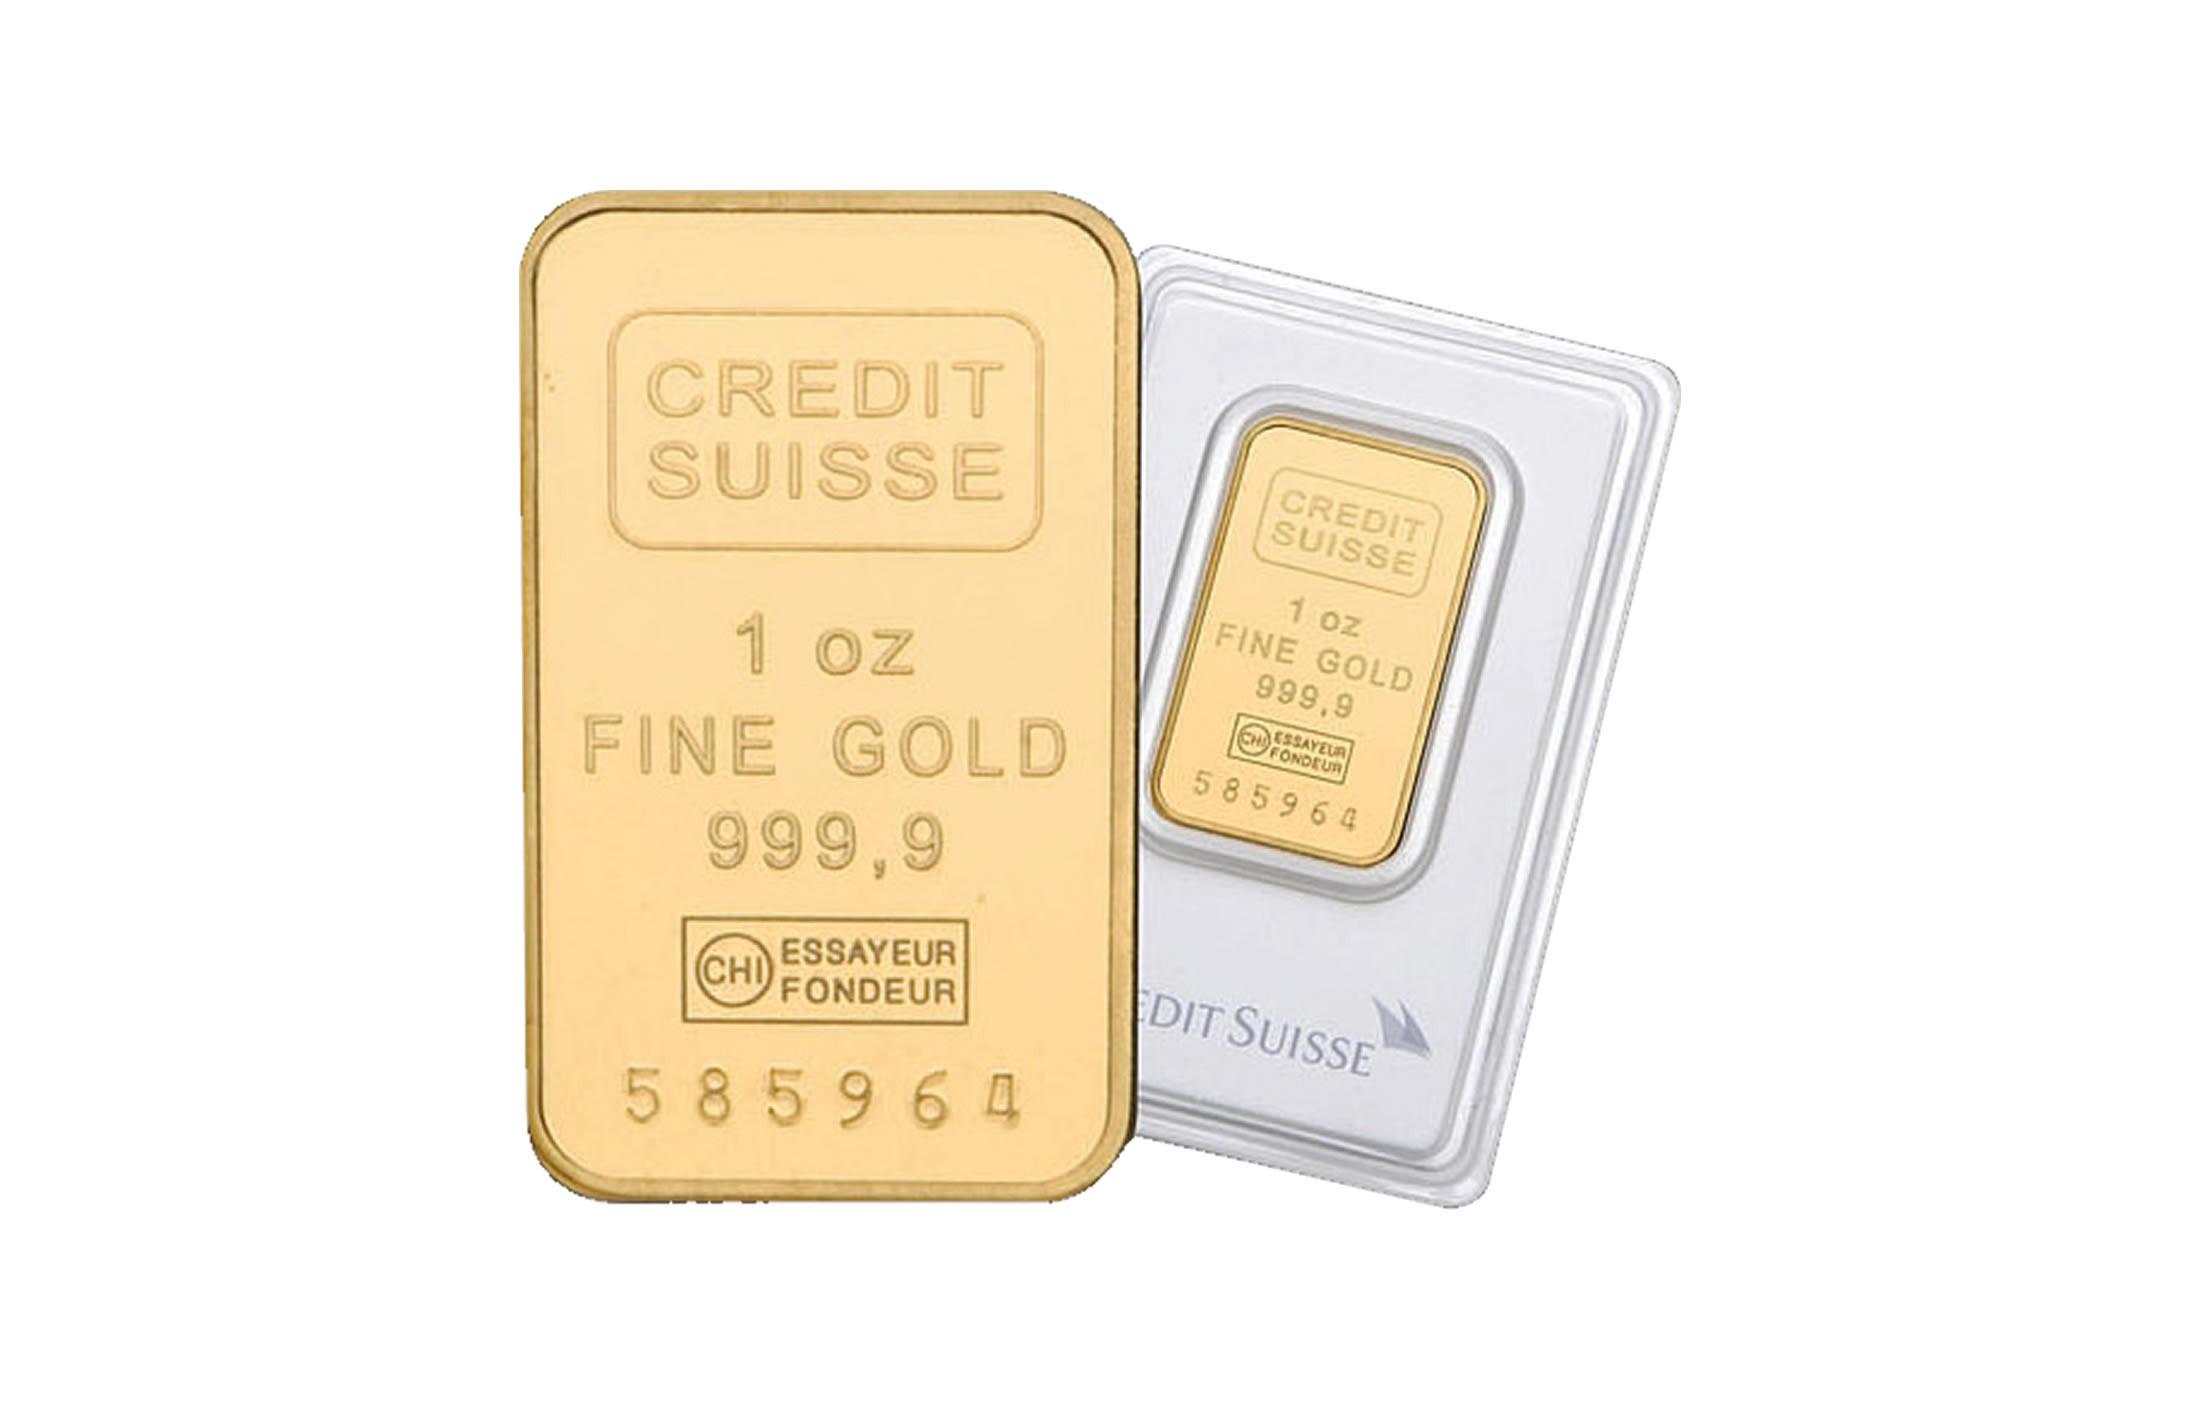 Credit Swiss 24 Karat 1 Oz Gold Bar